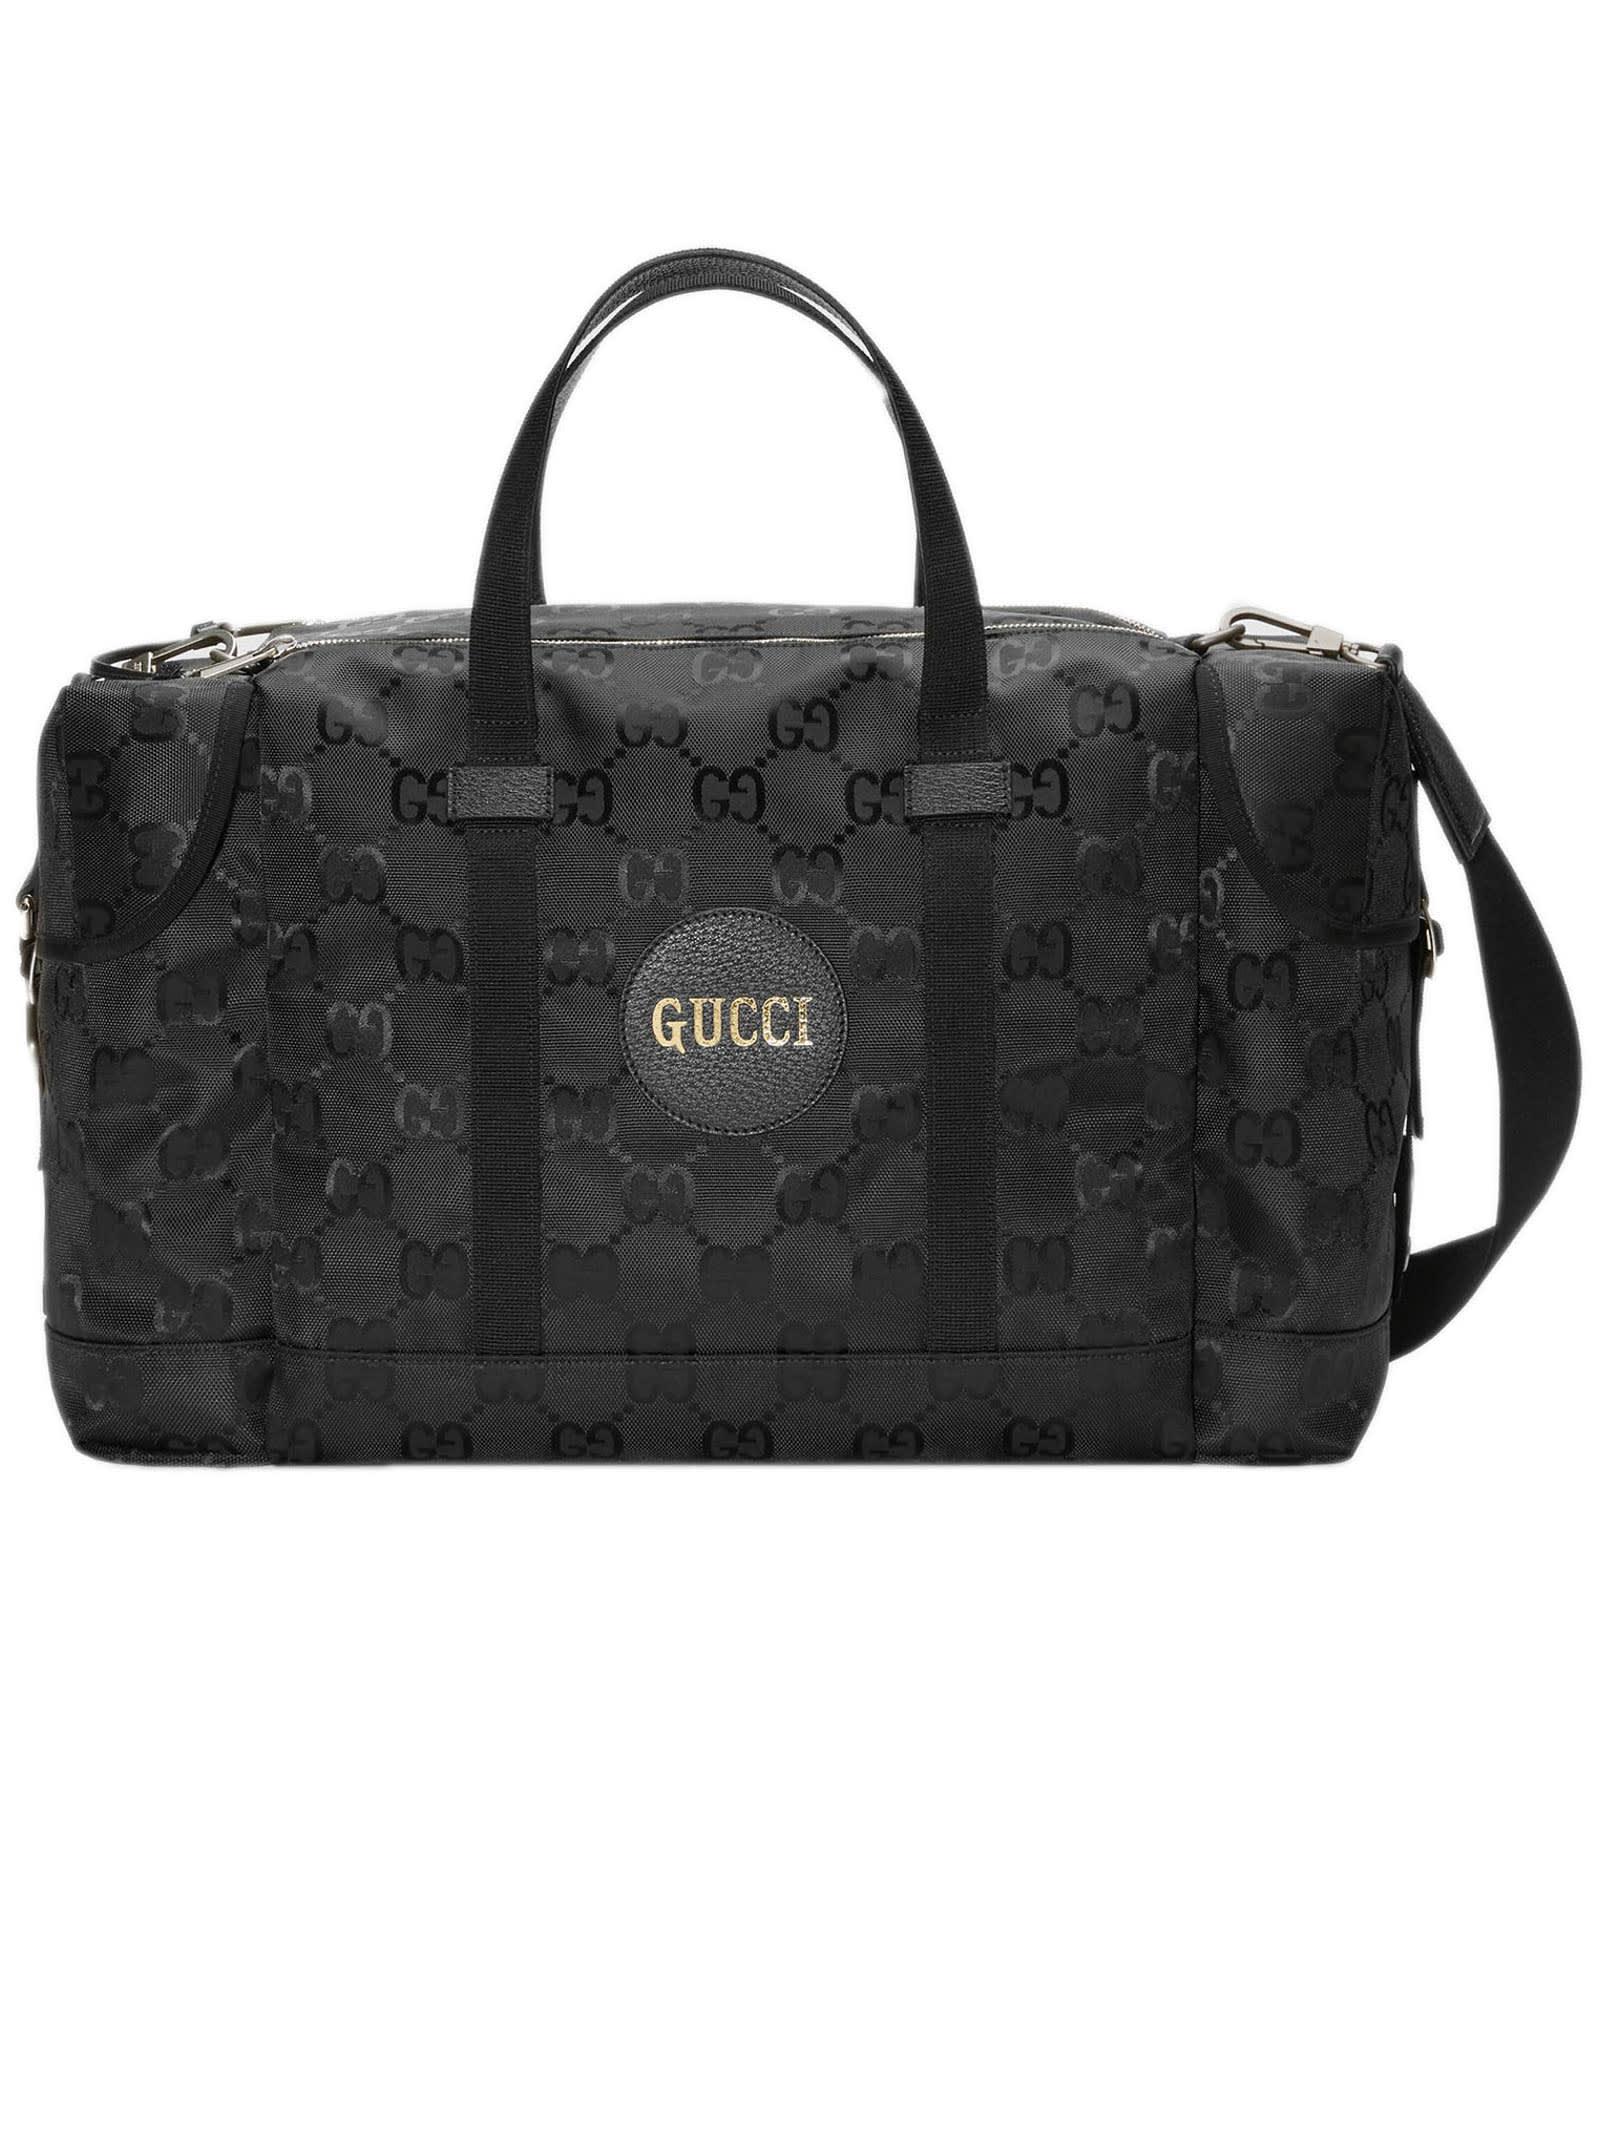 Gucci Gucci Off The Grid Duffle Bag